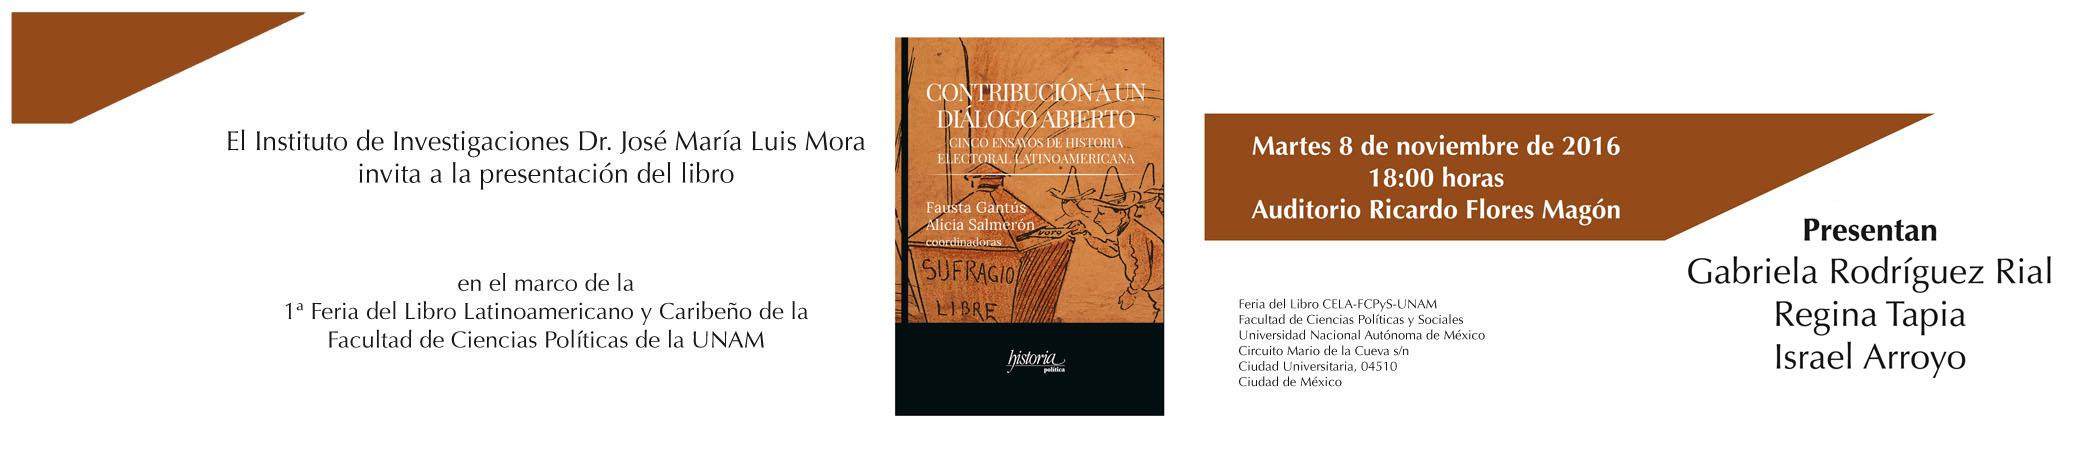 Presentación del libro Contribución a un diálogo abierto